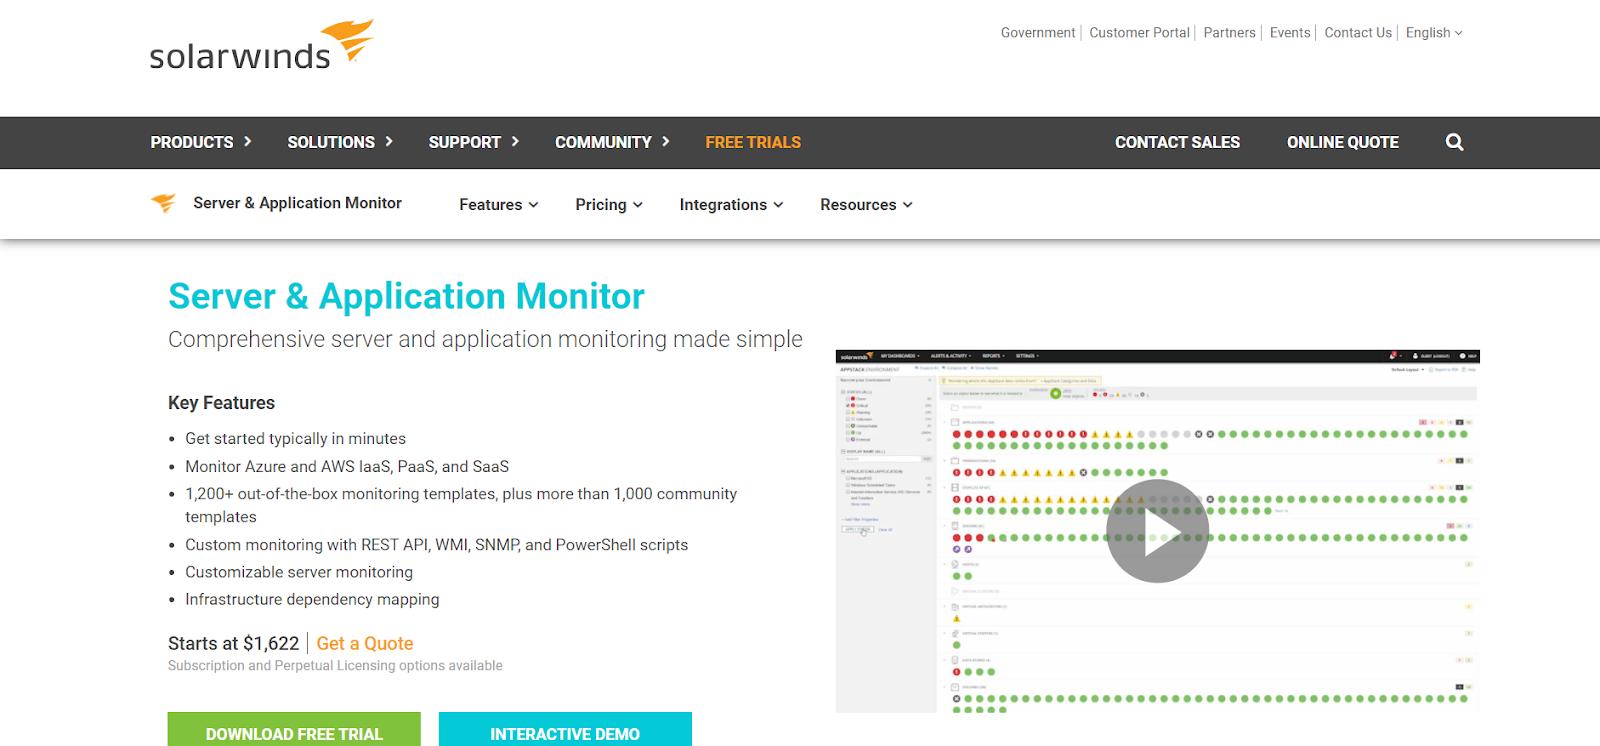 Solarwinds Server monitoring software